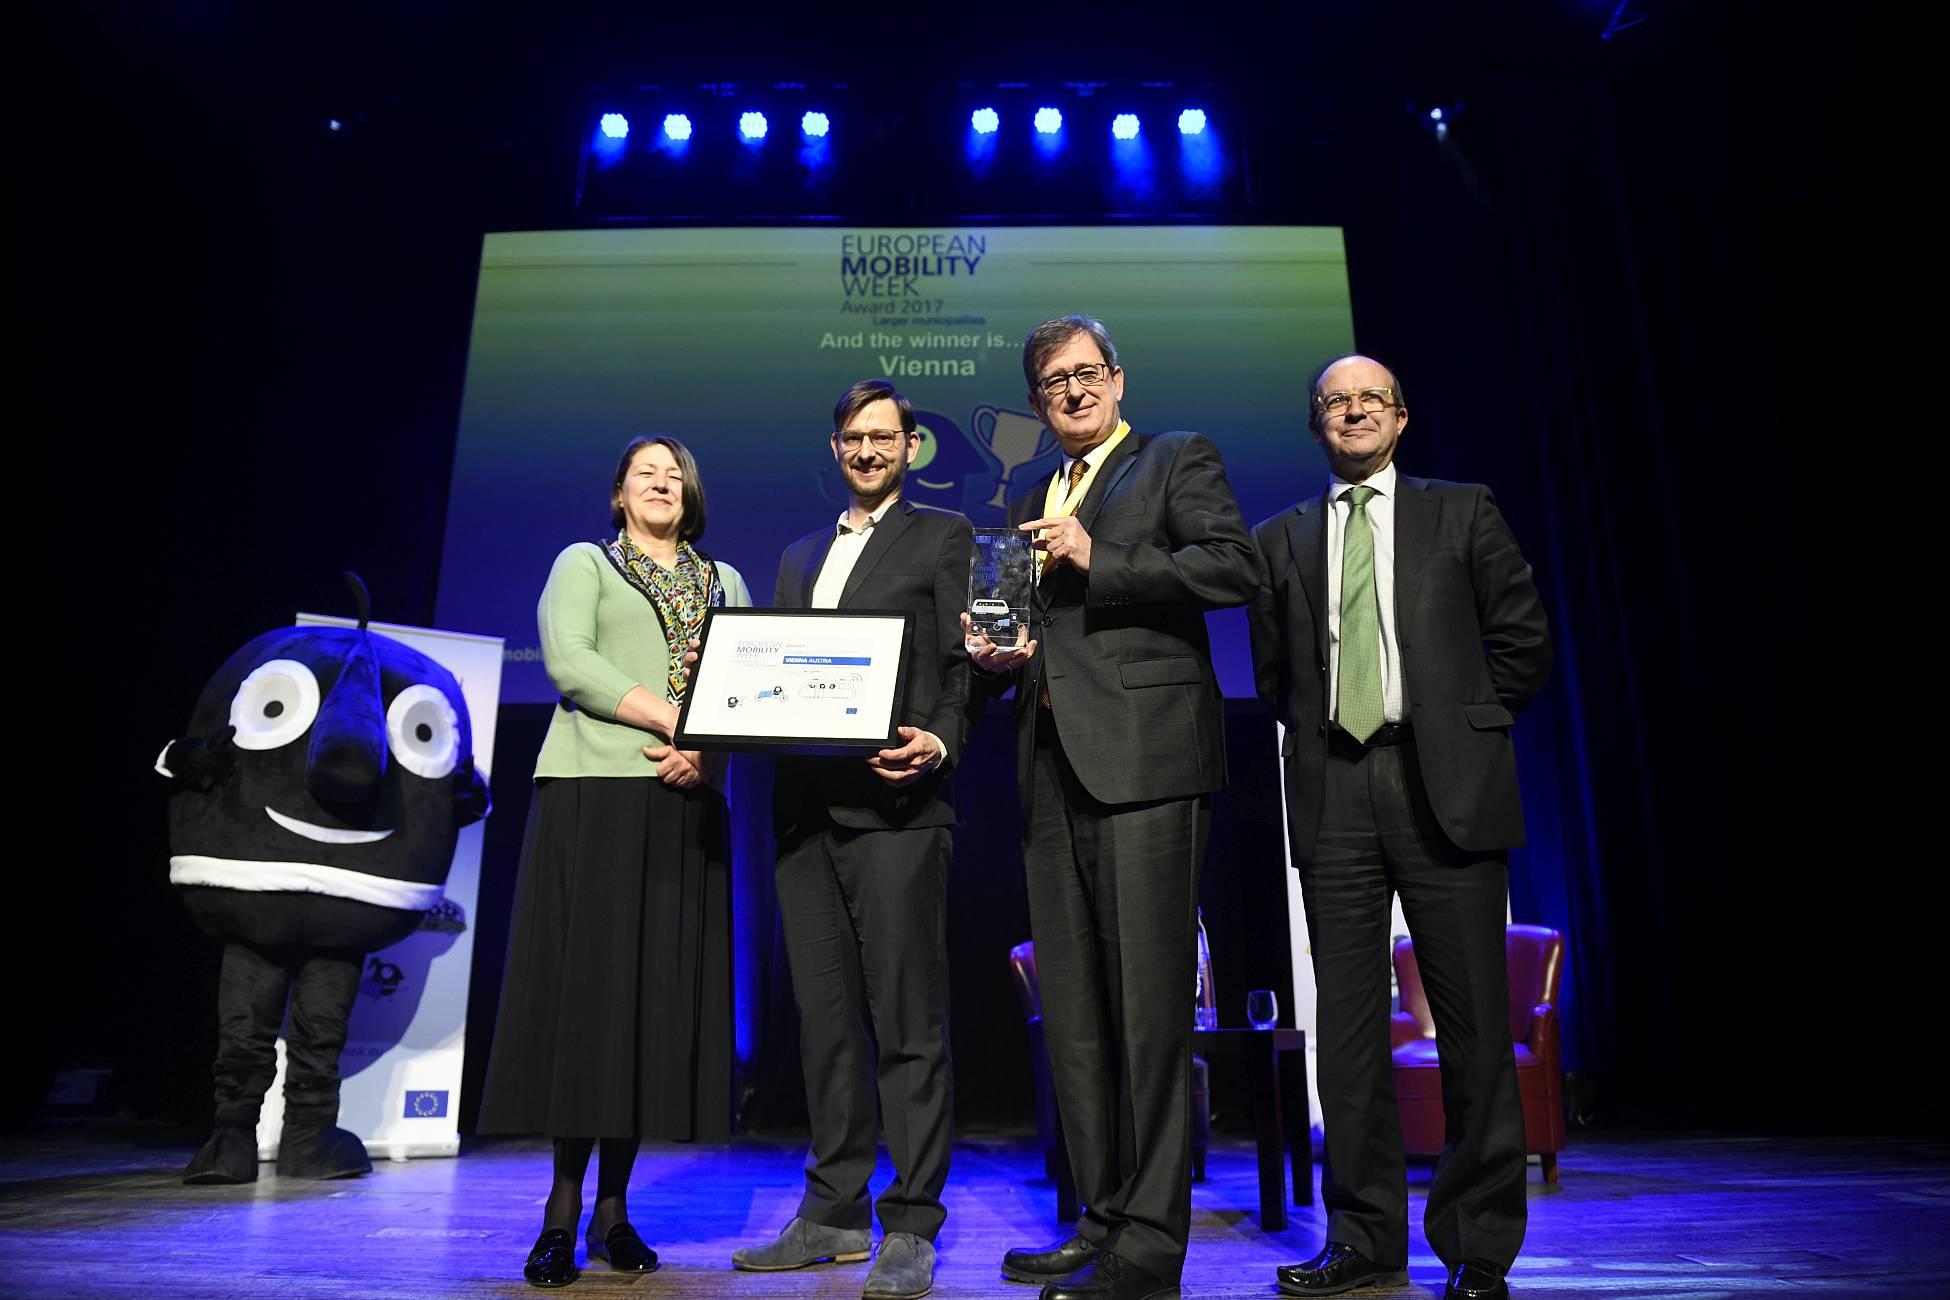 Preisverleihung zum European Mobility Week Award in Brüssel